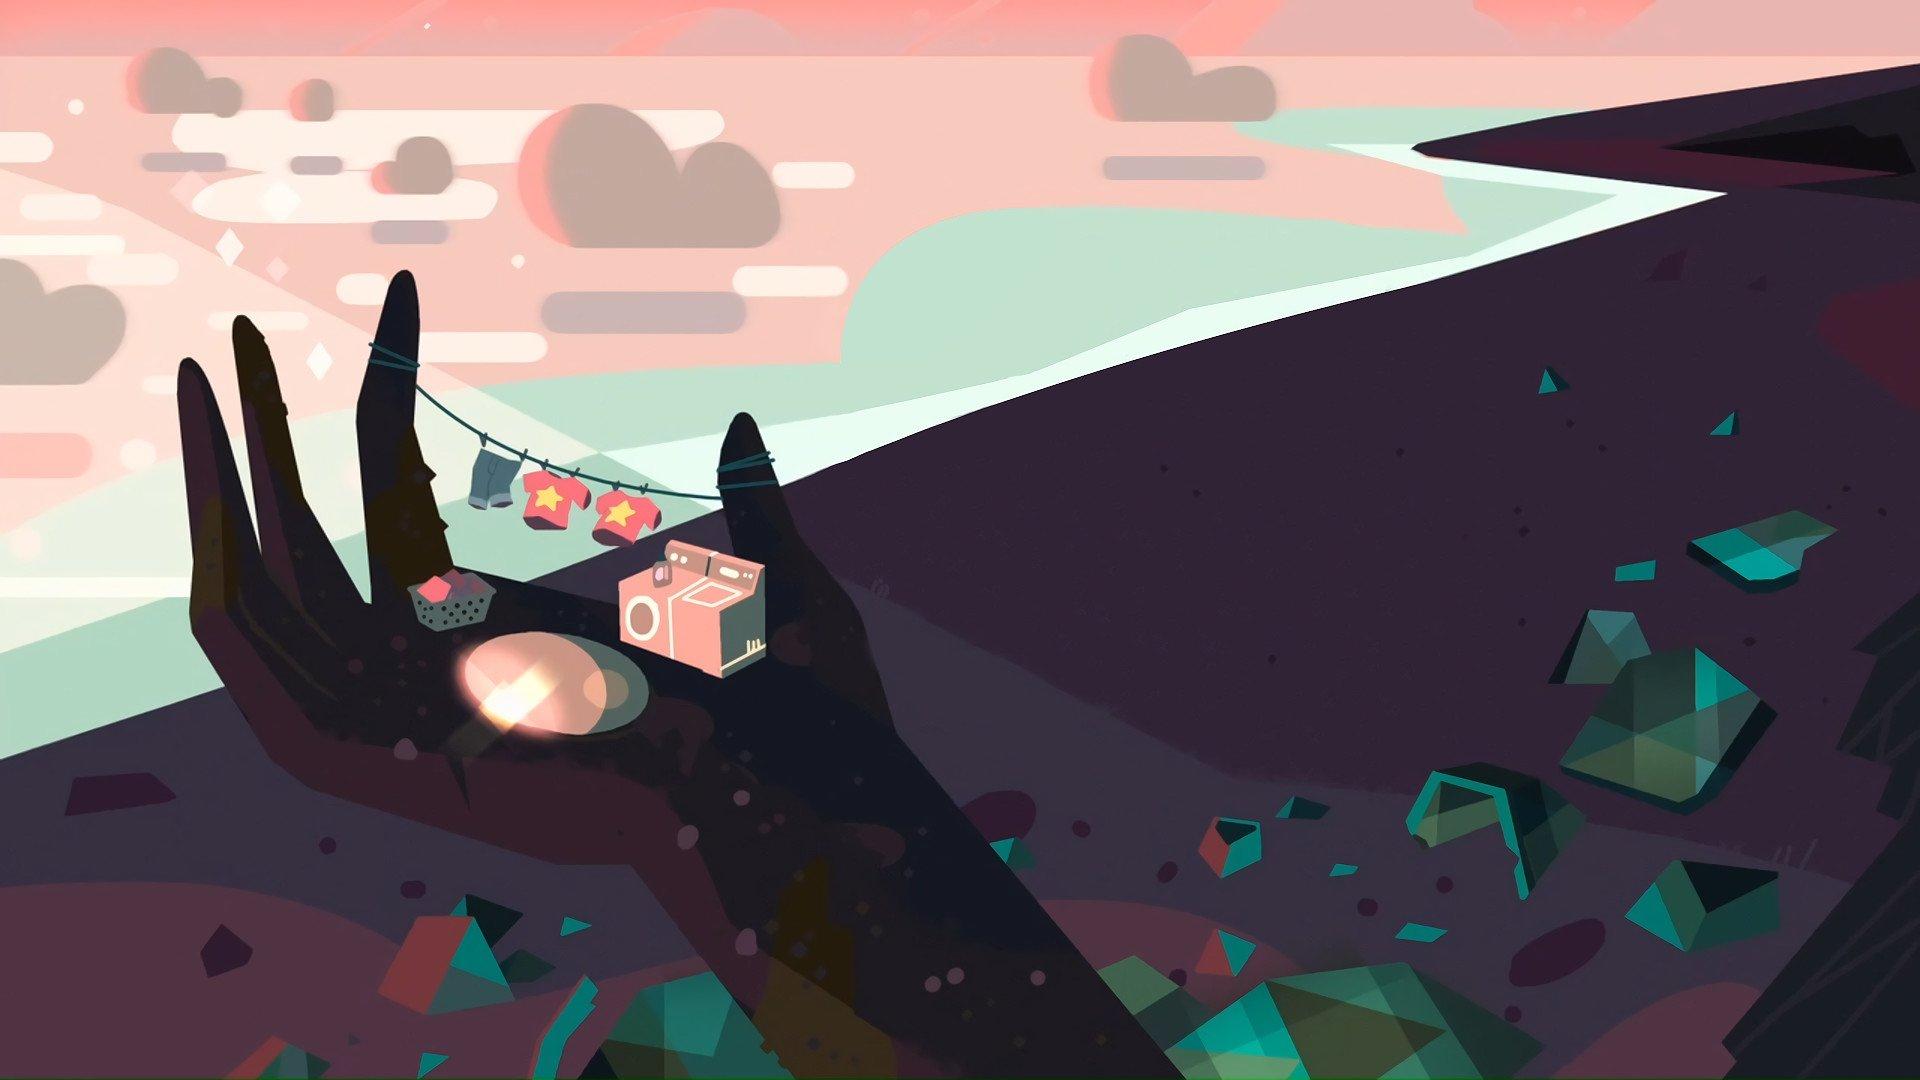 Steven Universe Wallpaper 1920x1080